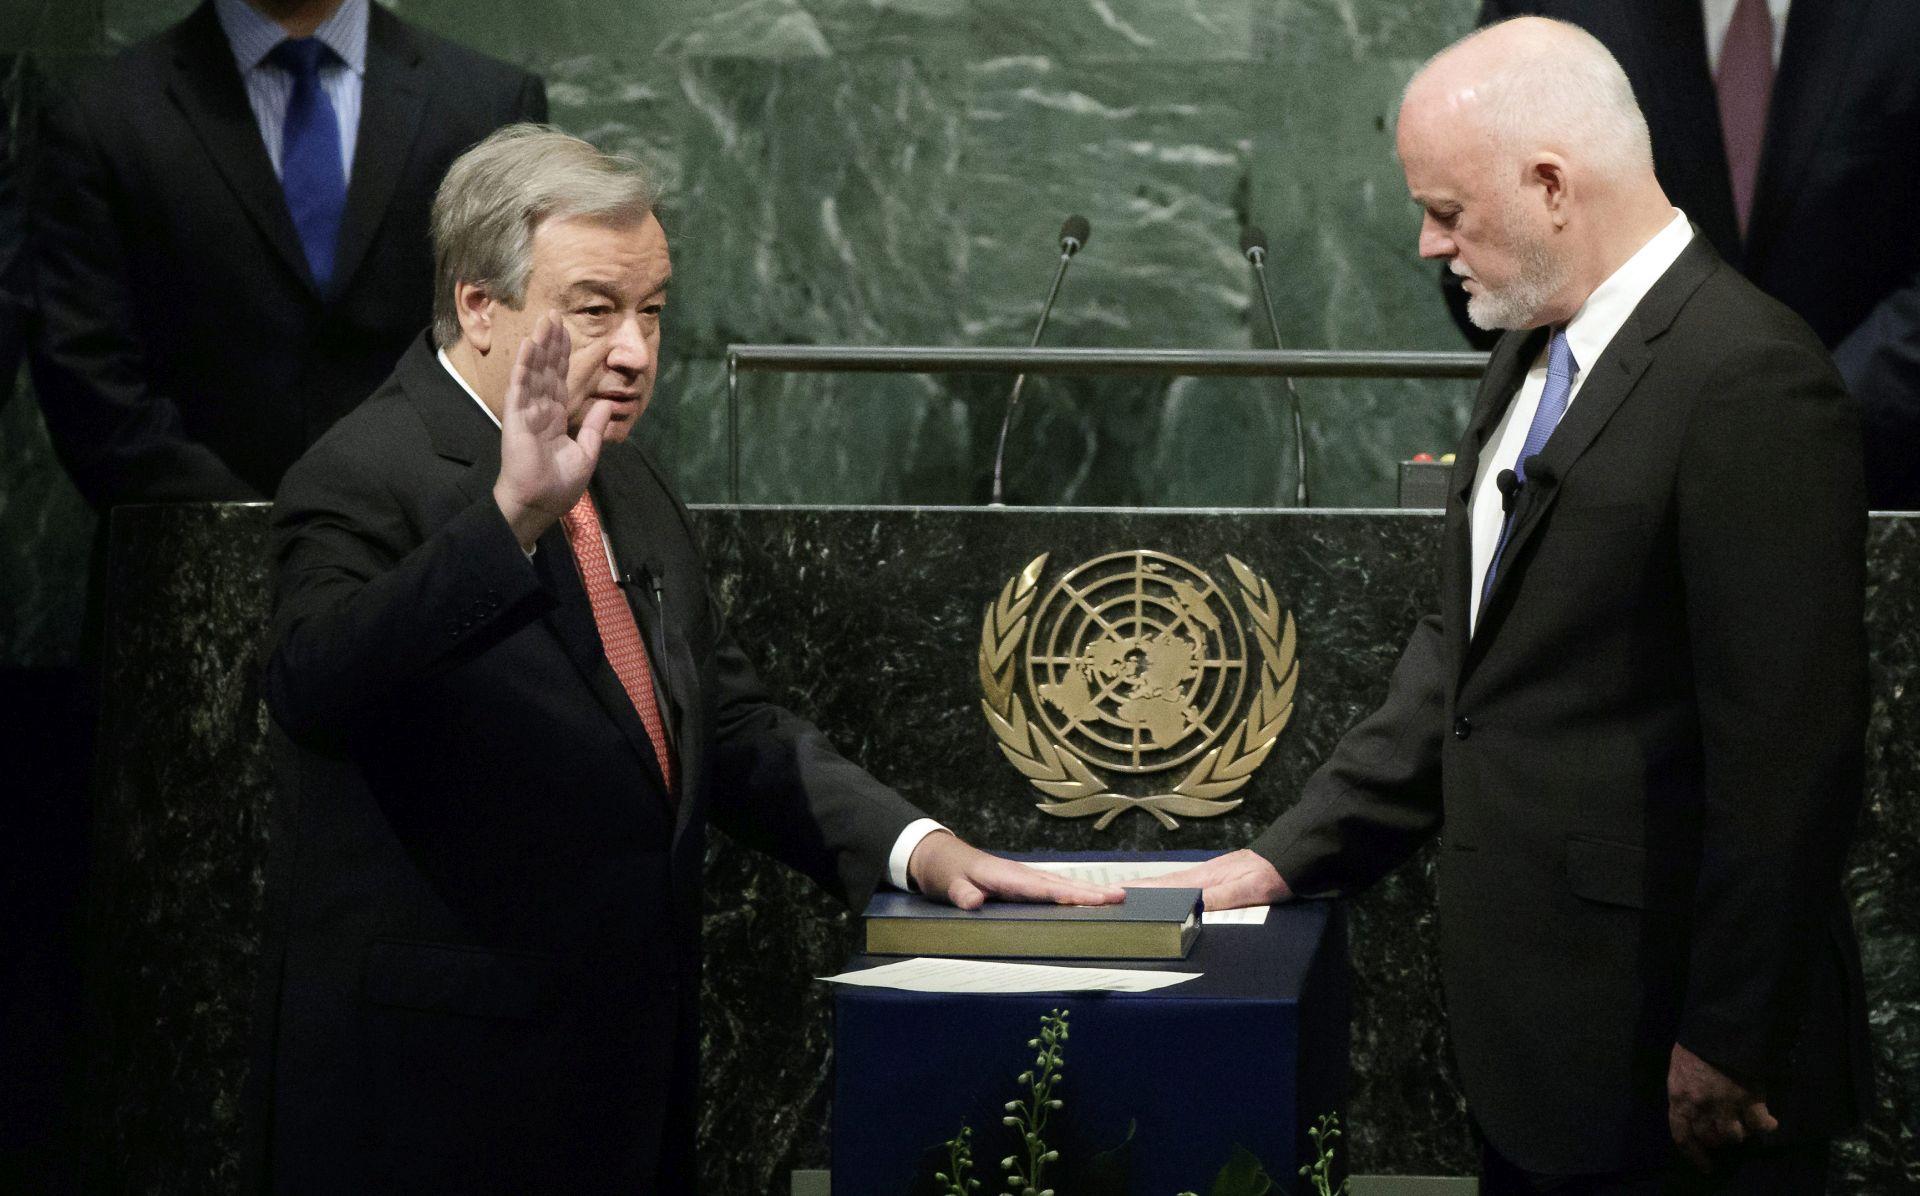 NASLJEDNIK BAN KI-MOONA: Guterres prisegnuo za novog glavnog tajnika UN-a